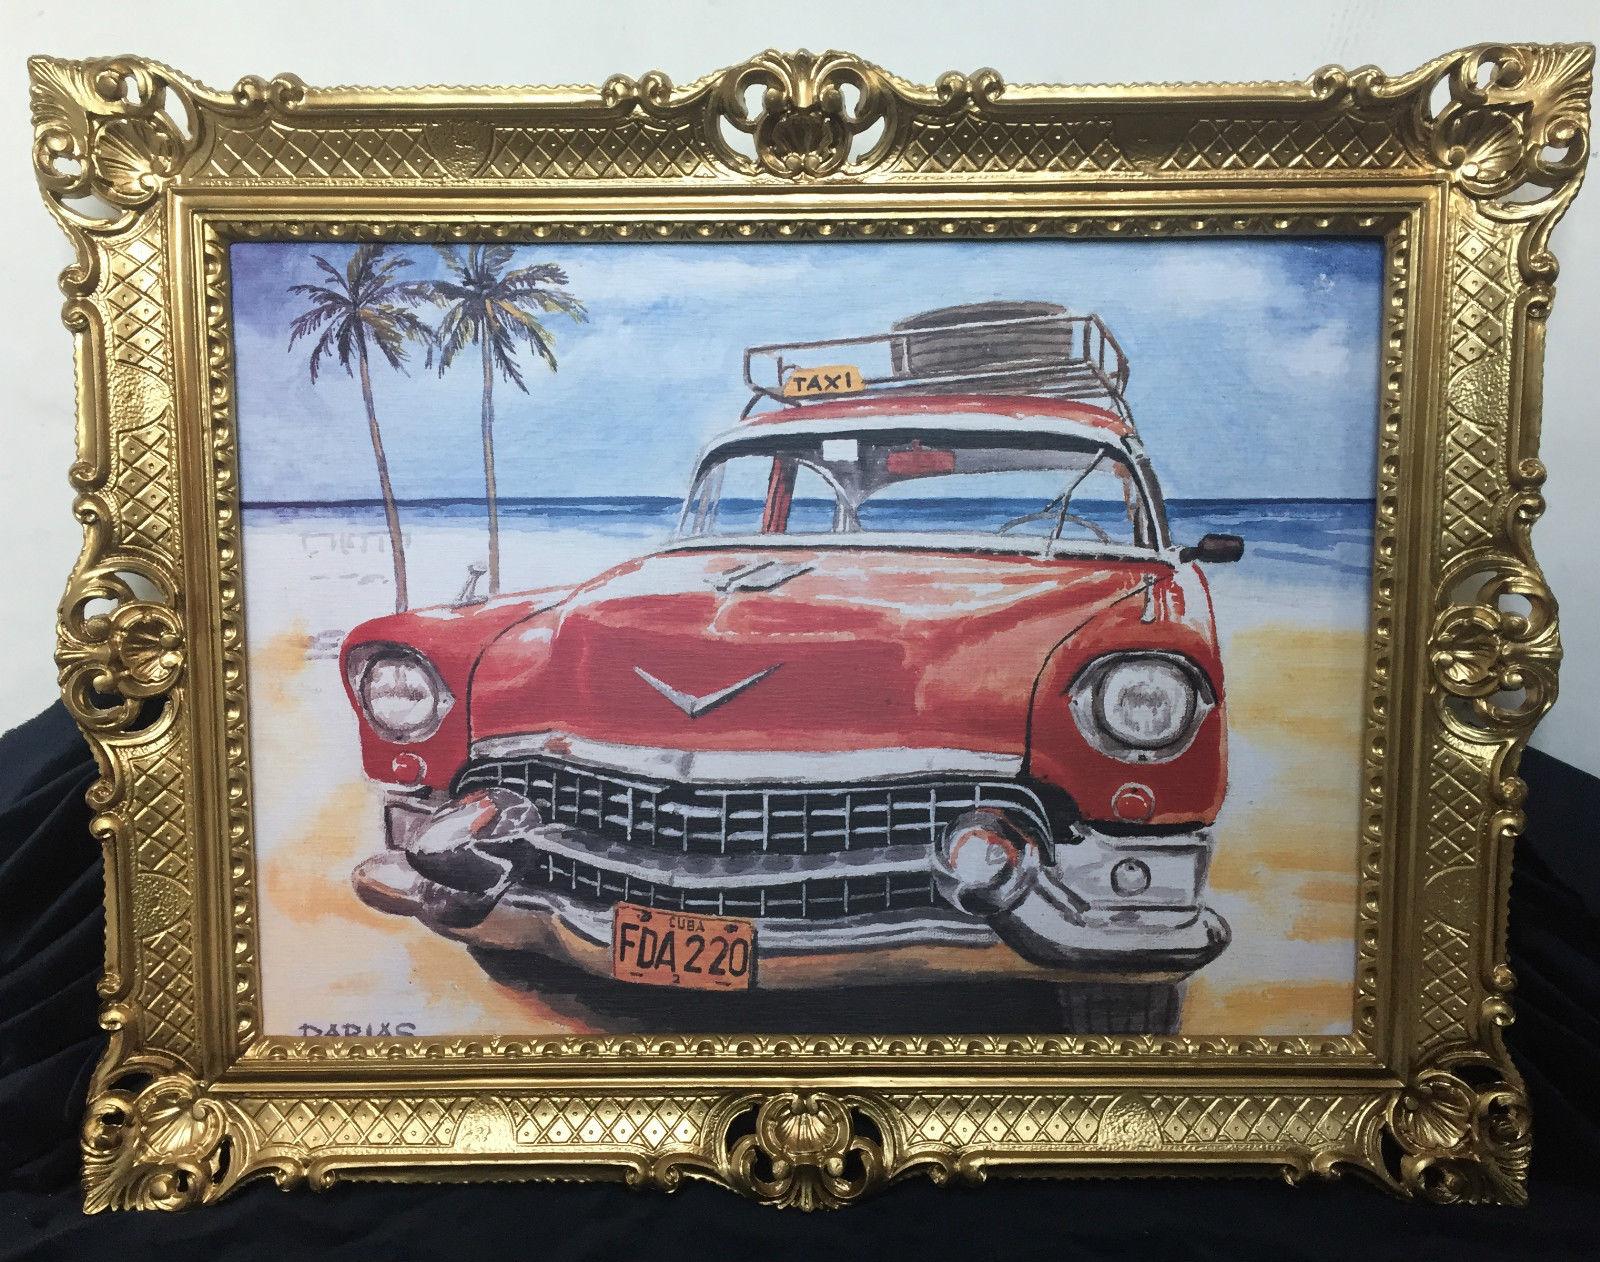 Auto Cuba Taxi Rot Bild Rahmen 70x90 Oldtimer Classic Cuban Auto ...